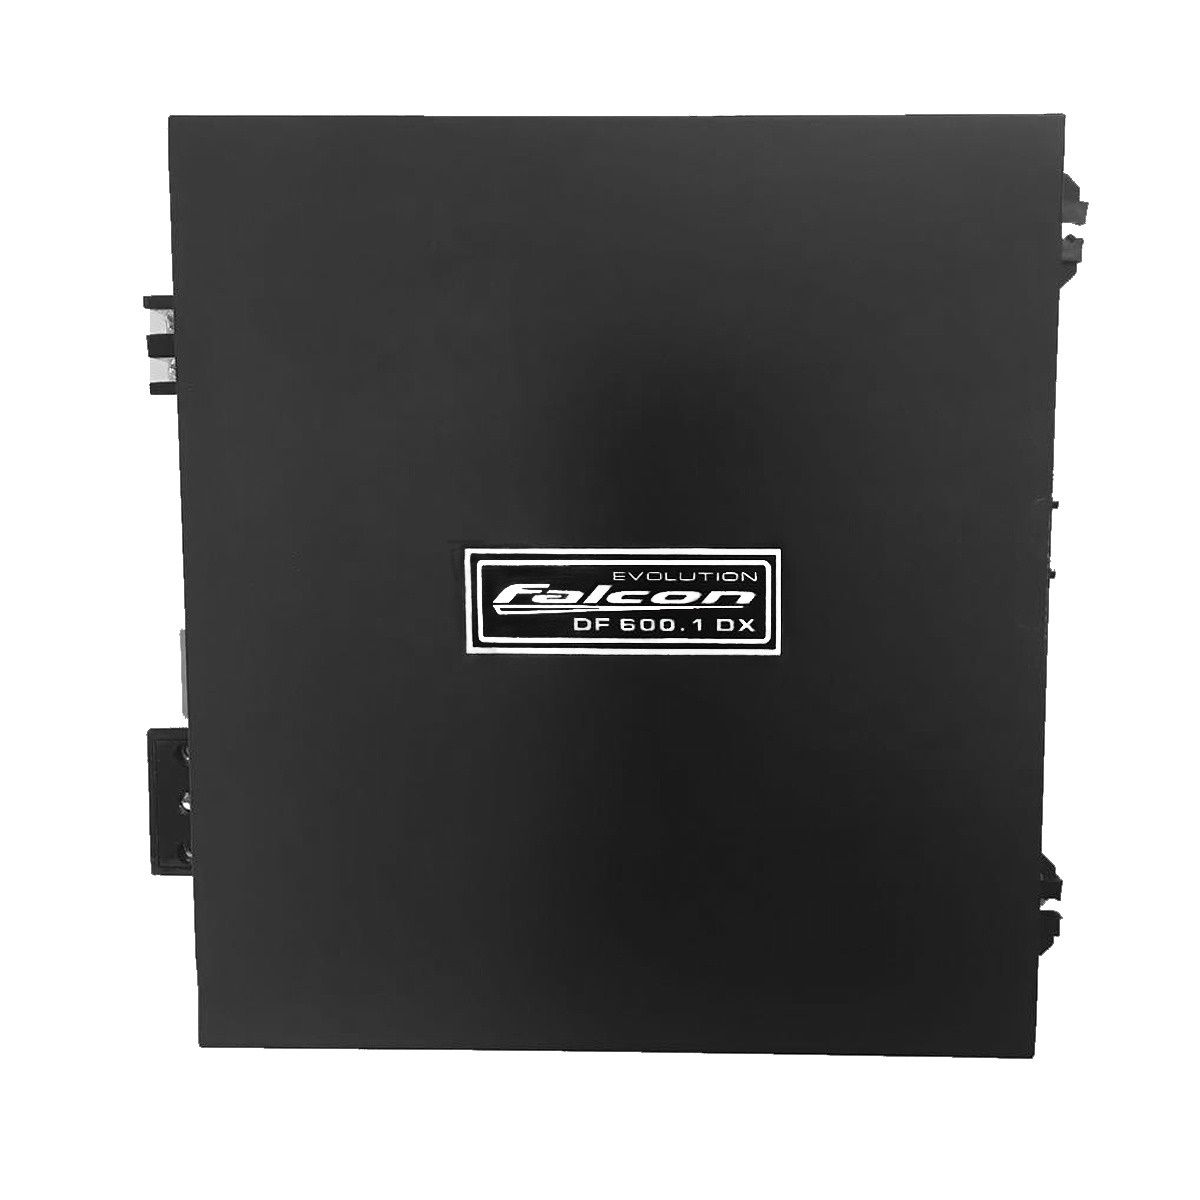 Módulo Amplificador Falcon DF600.1DX 600W Rms 2 Ohms 1 Canal